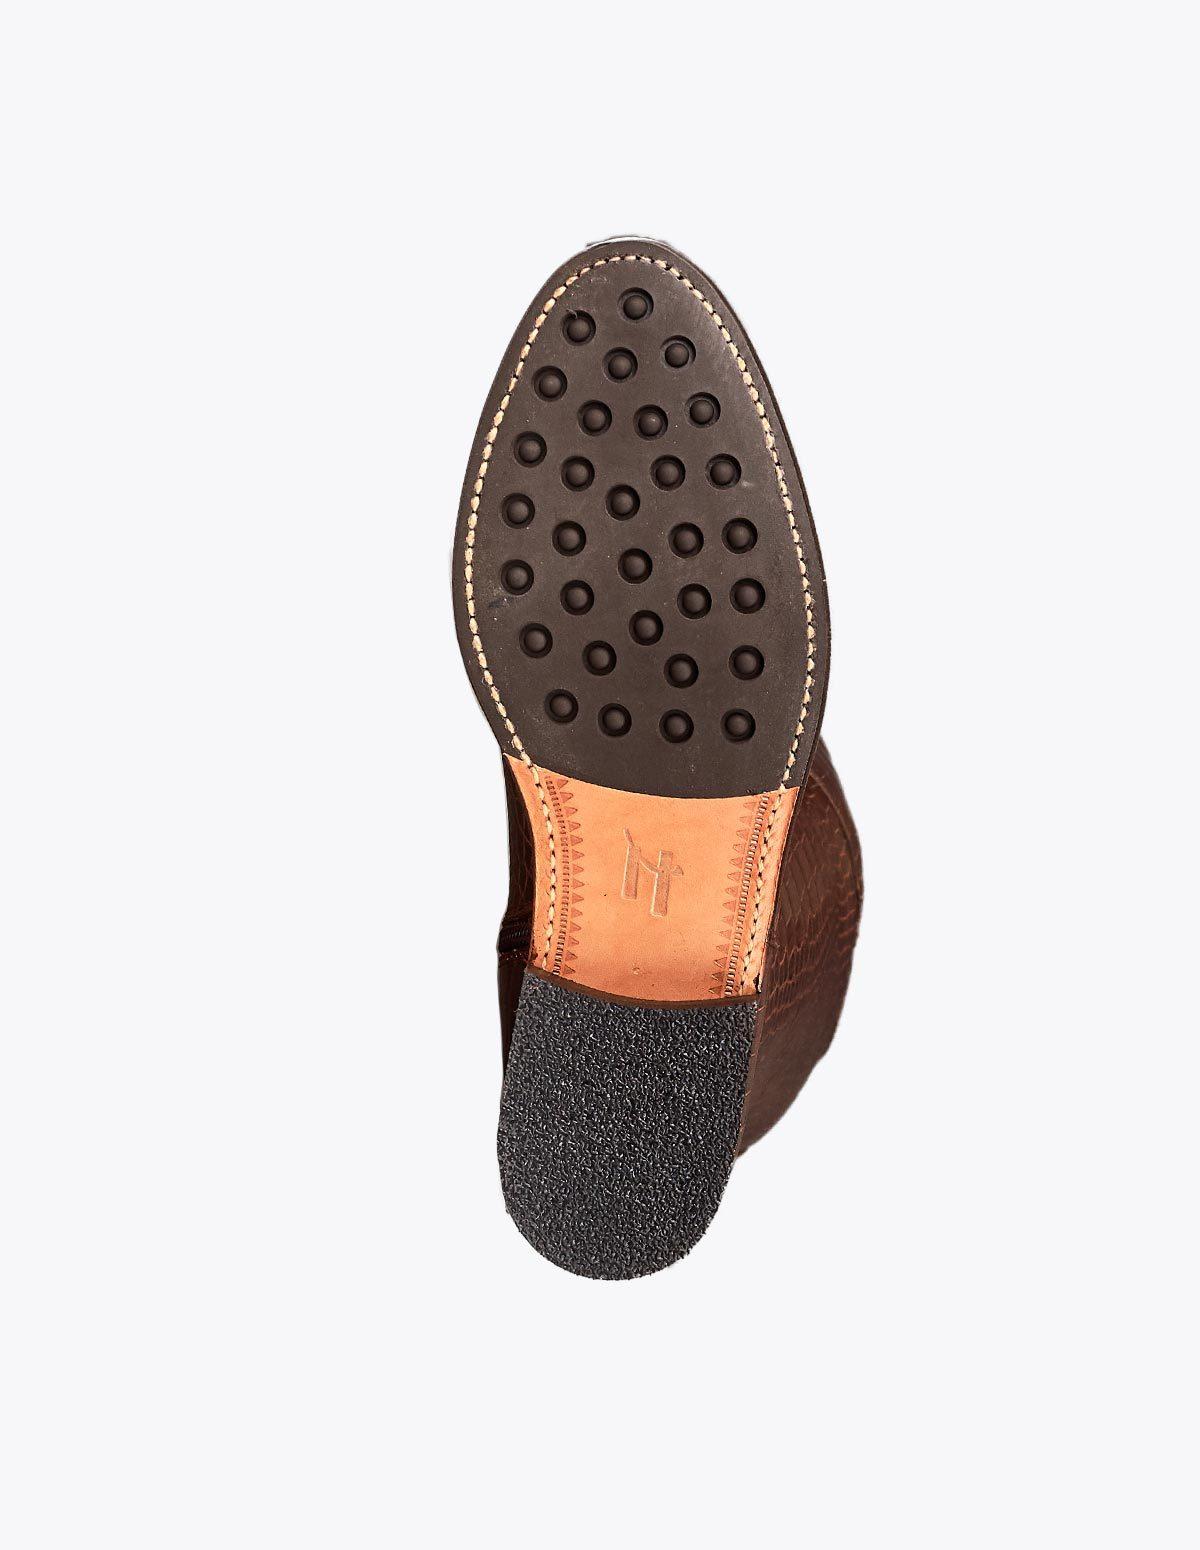 Bota Campera , tailor made shoes, schuhe nach mass en mandalashoes Santanyí Mallorca